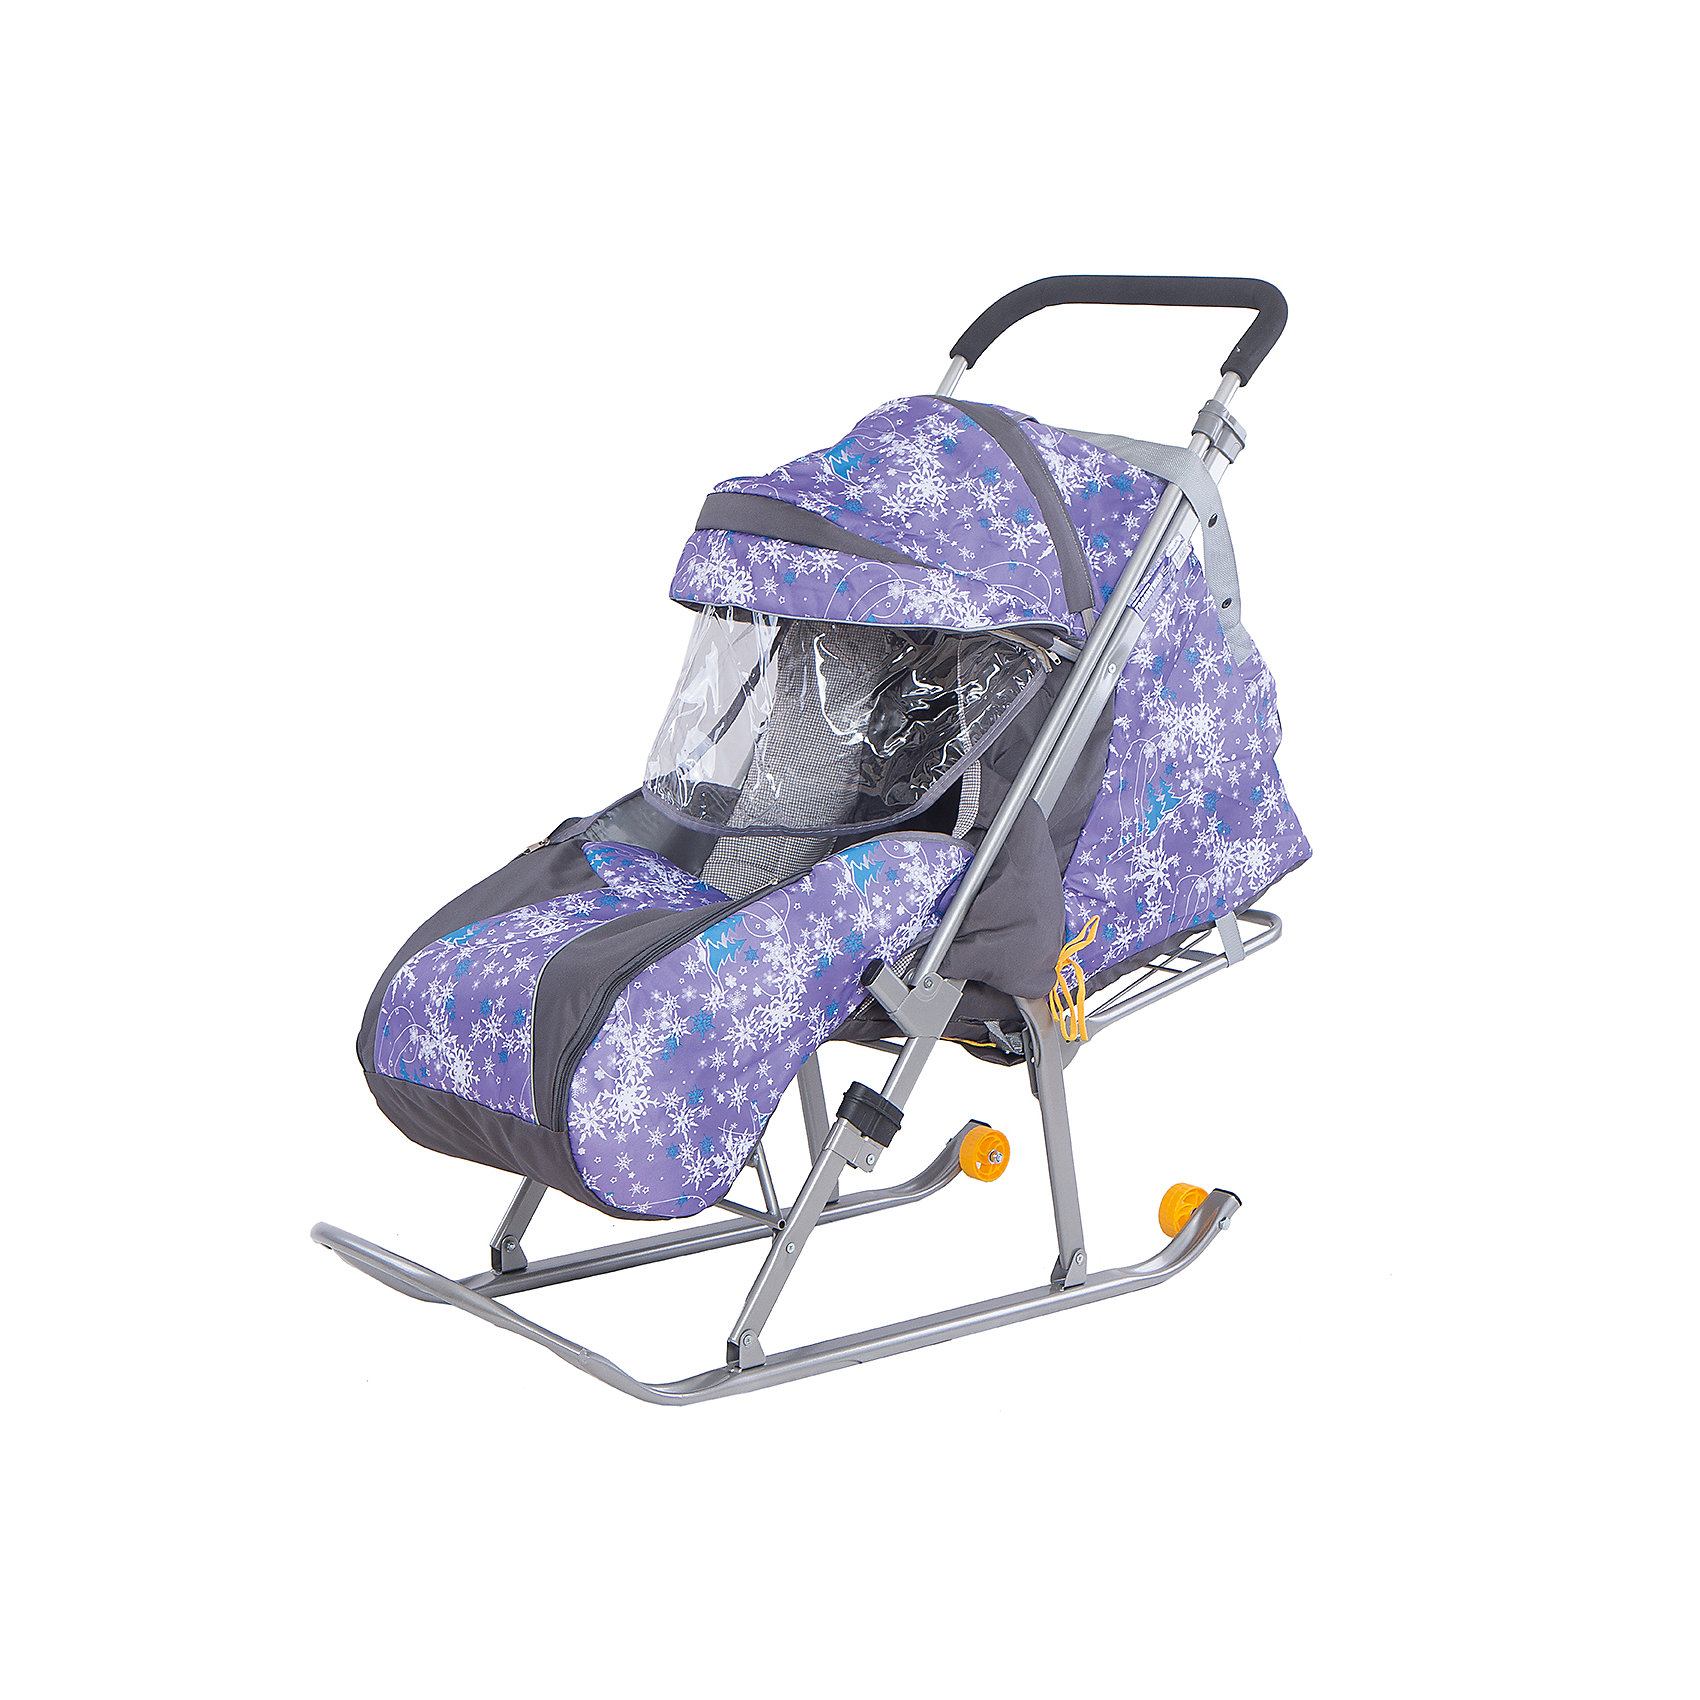 GALAXY Санки-коляска Галактика. Скандинавия, Galaxy, елки на фиолетовом санки коляски galaxy снежинка универсал